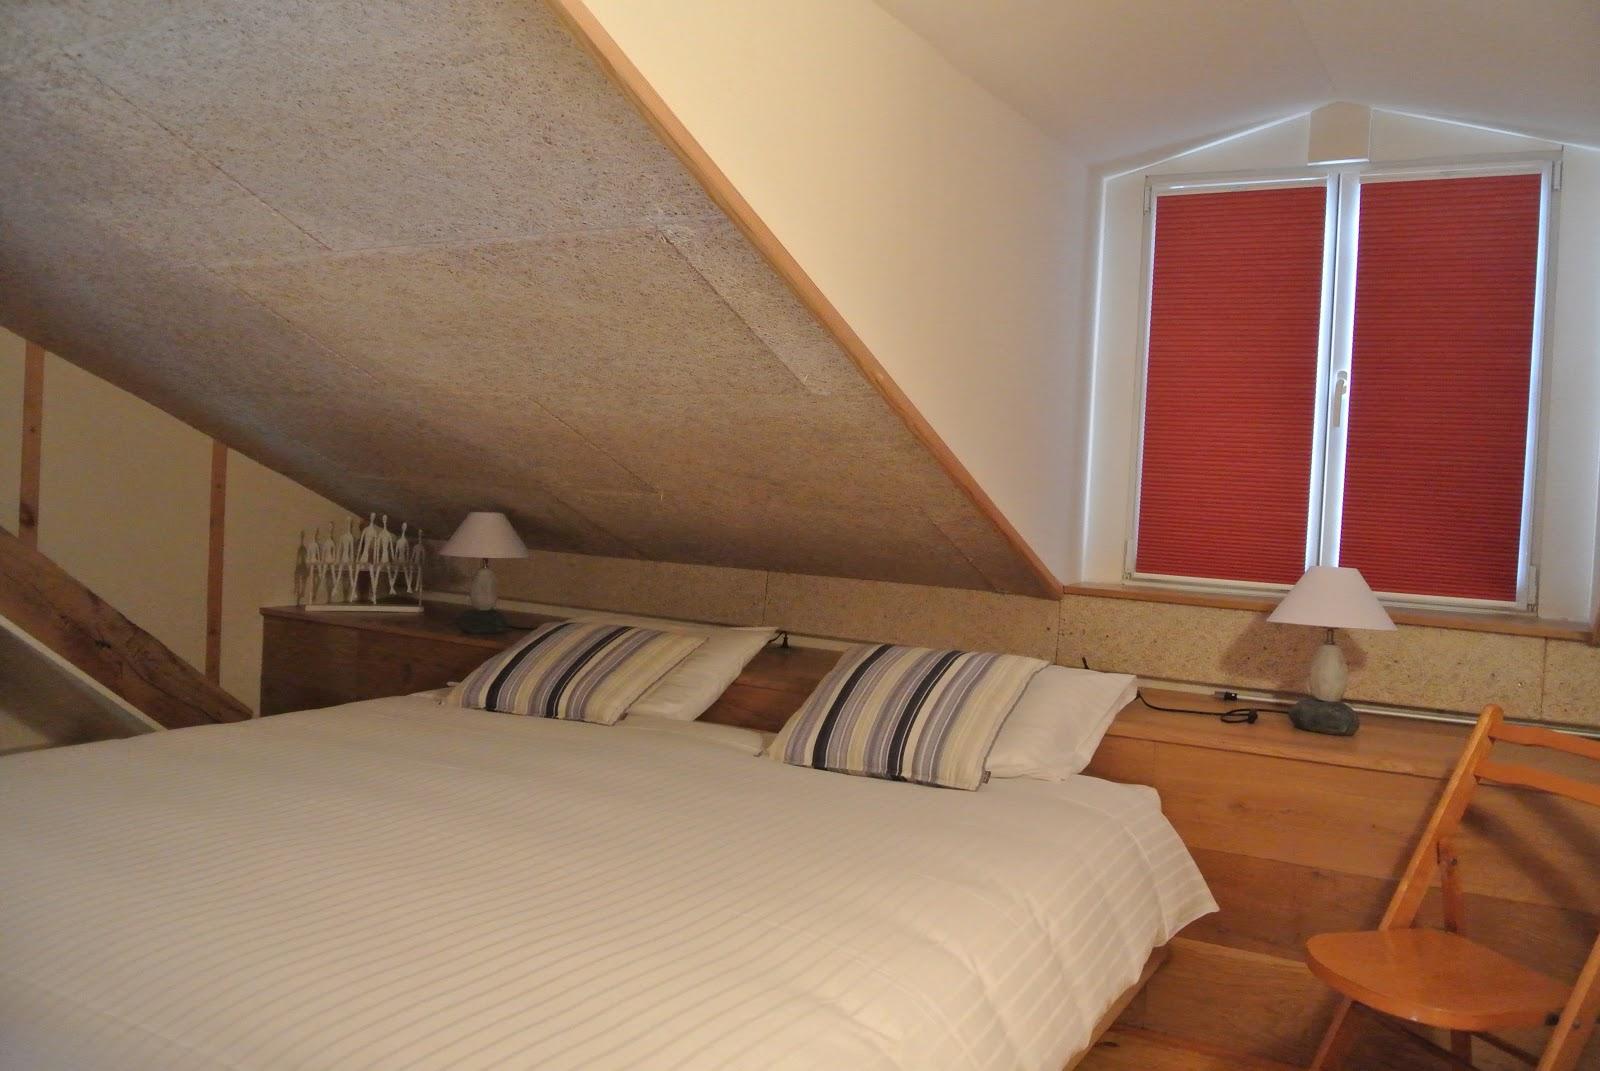 Domaine De L\'Alu: Vakantie-Appartement (A) 2 kamers (60m²) 3 personen